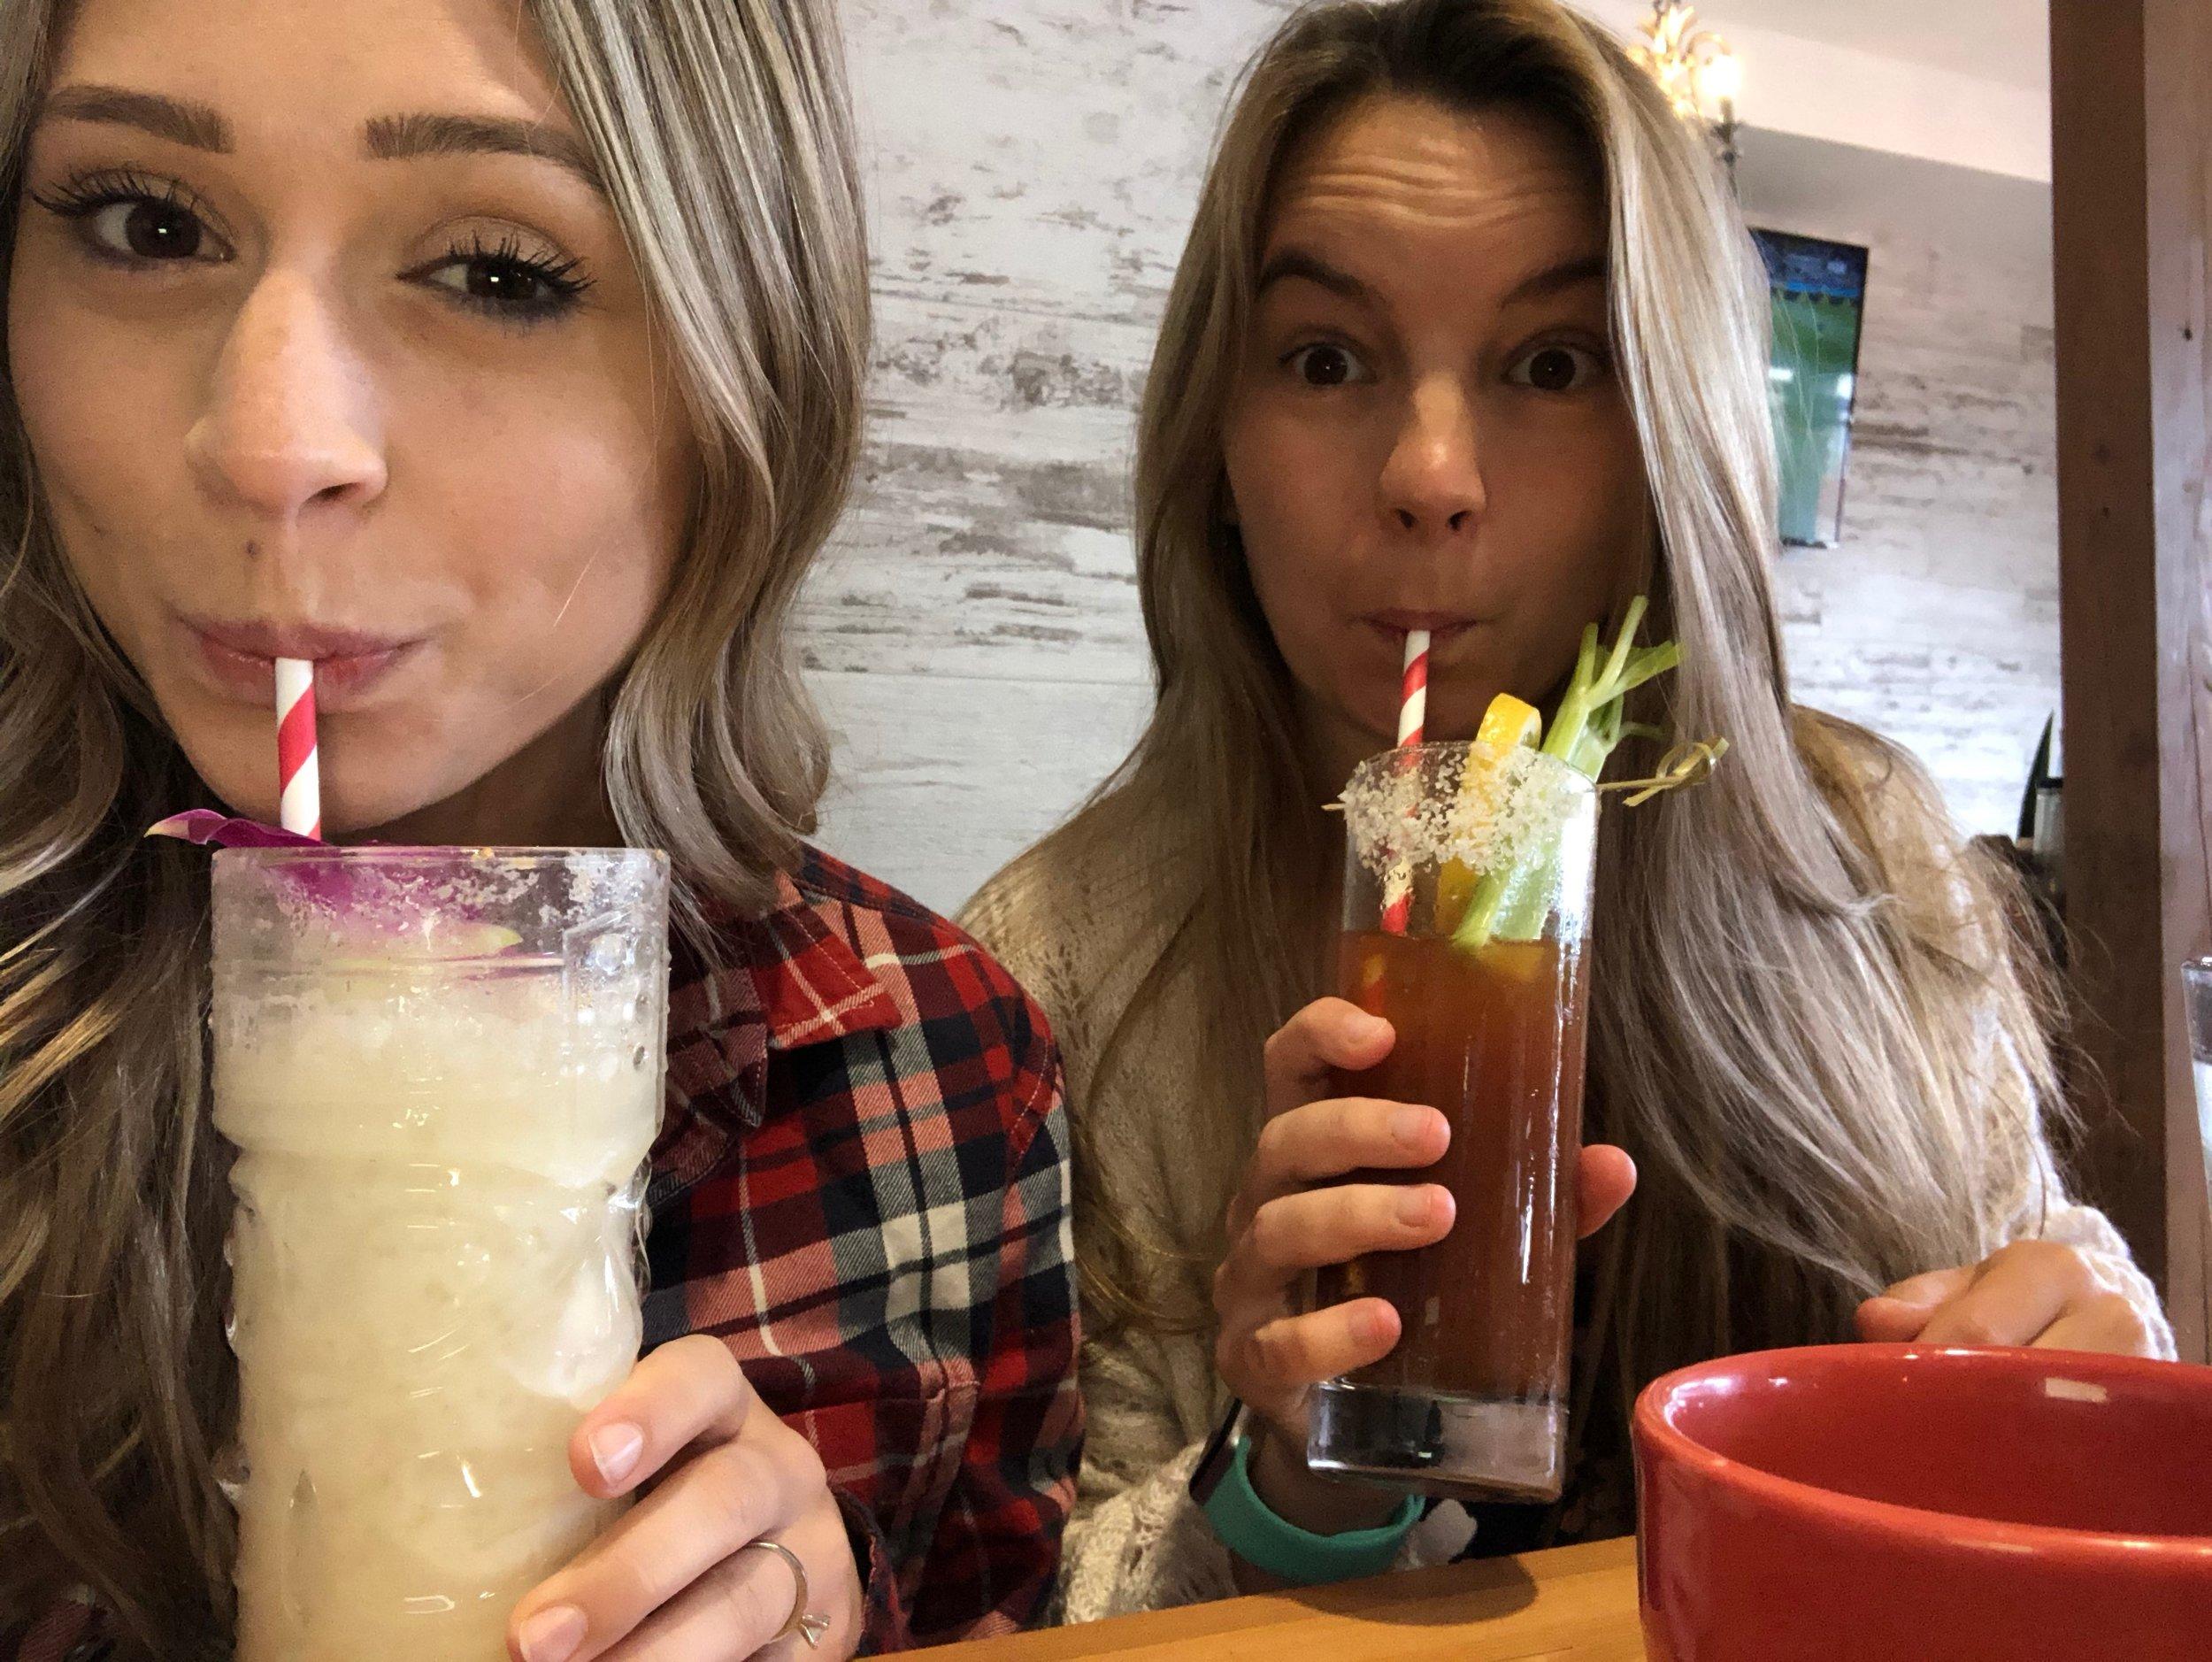 miss bs cocunut club bloodyy mary obsessed bloodymaryobsessed and  rum drinks.jpg